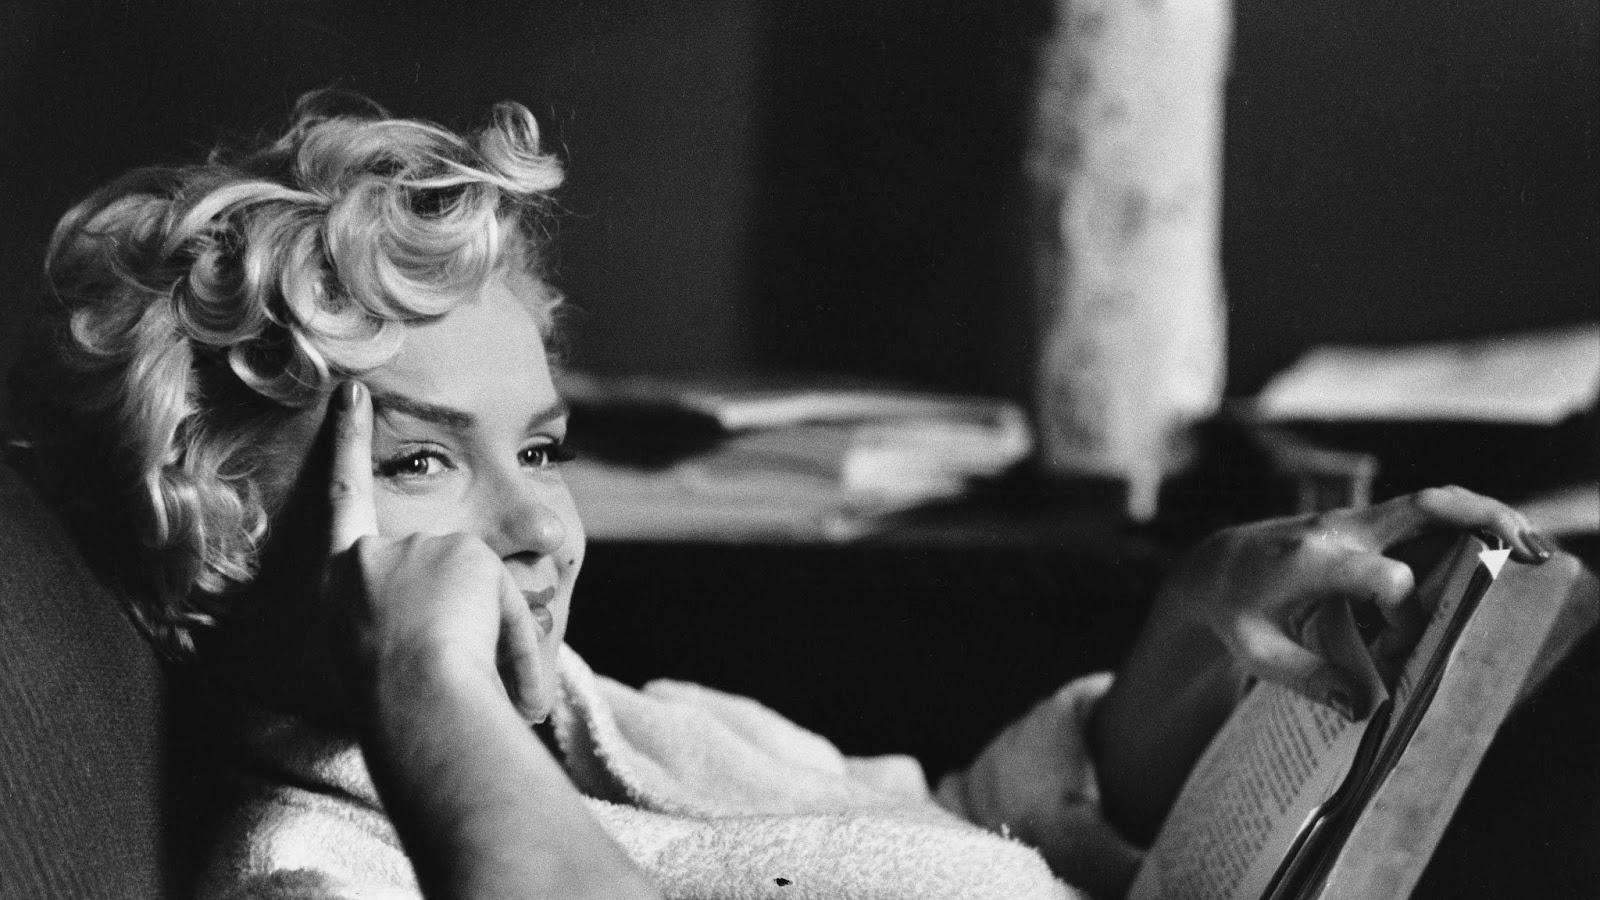 d1a35-elliott_erwitt_usa_new_york_us_actress_marilyn_monroe_1956_03